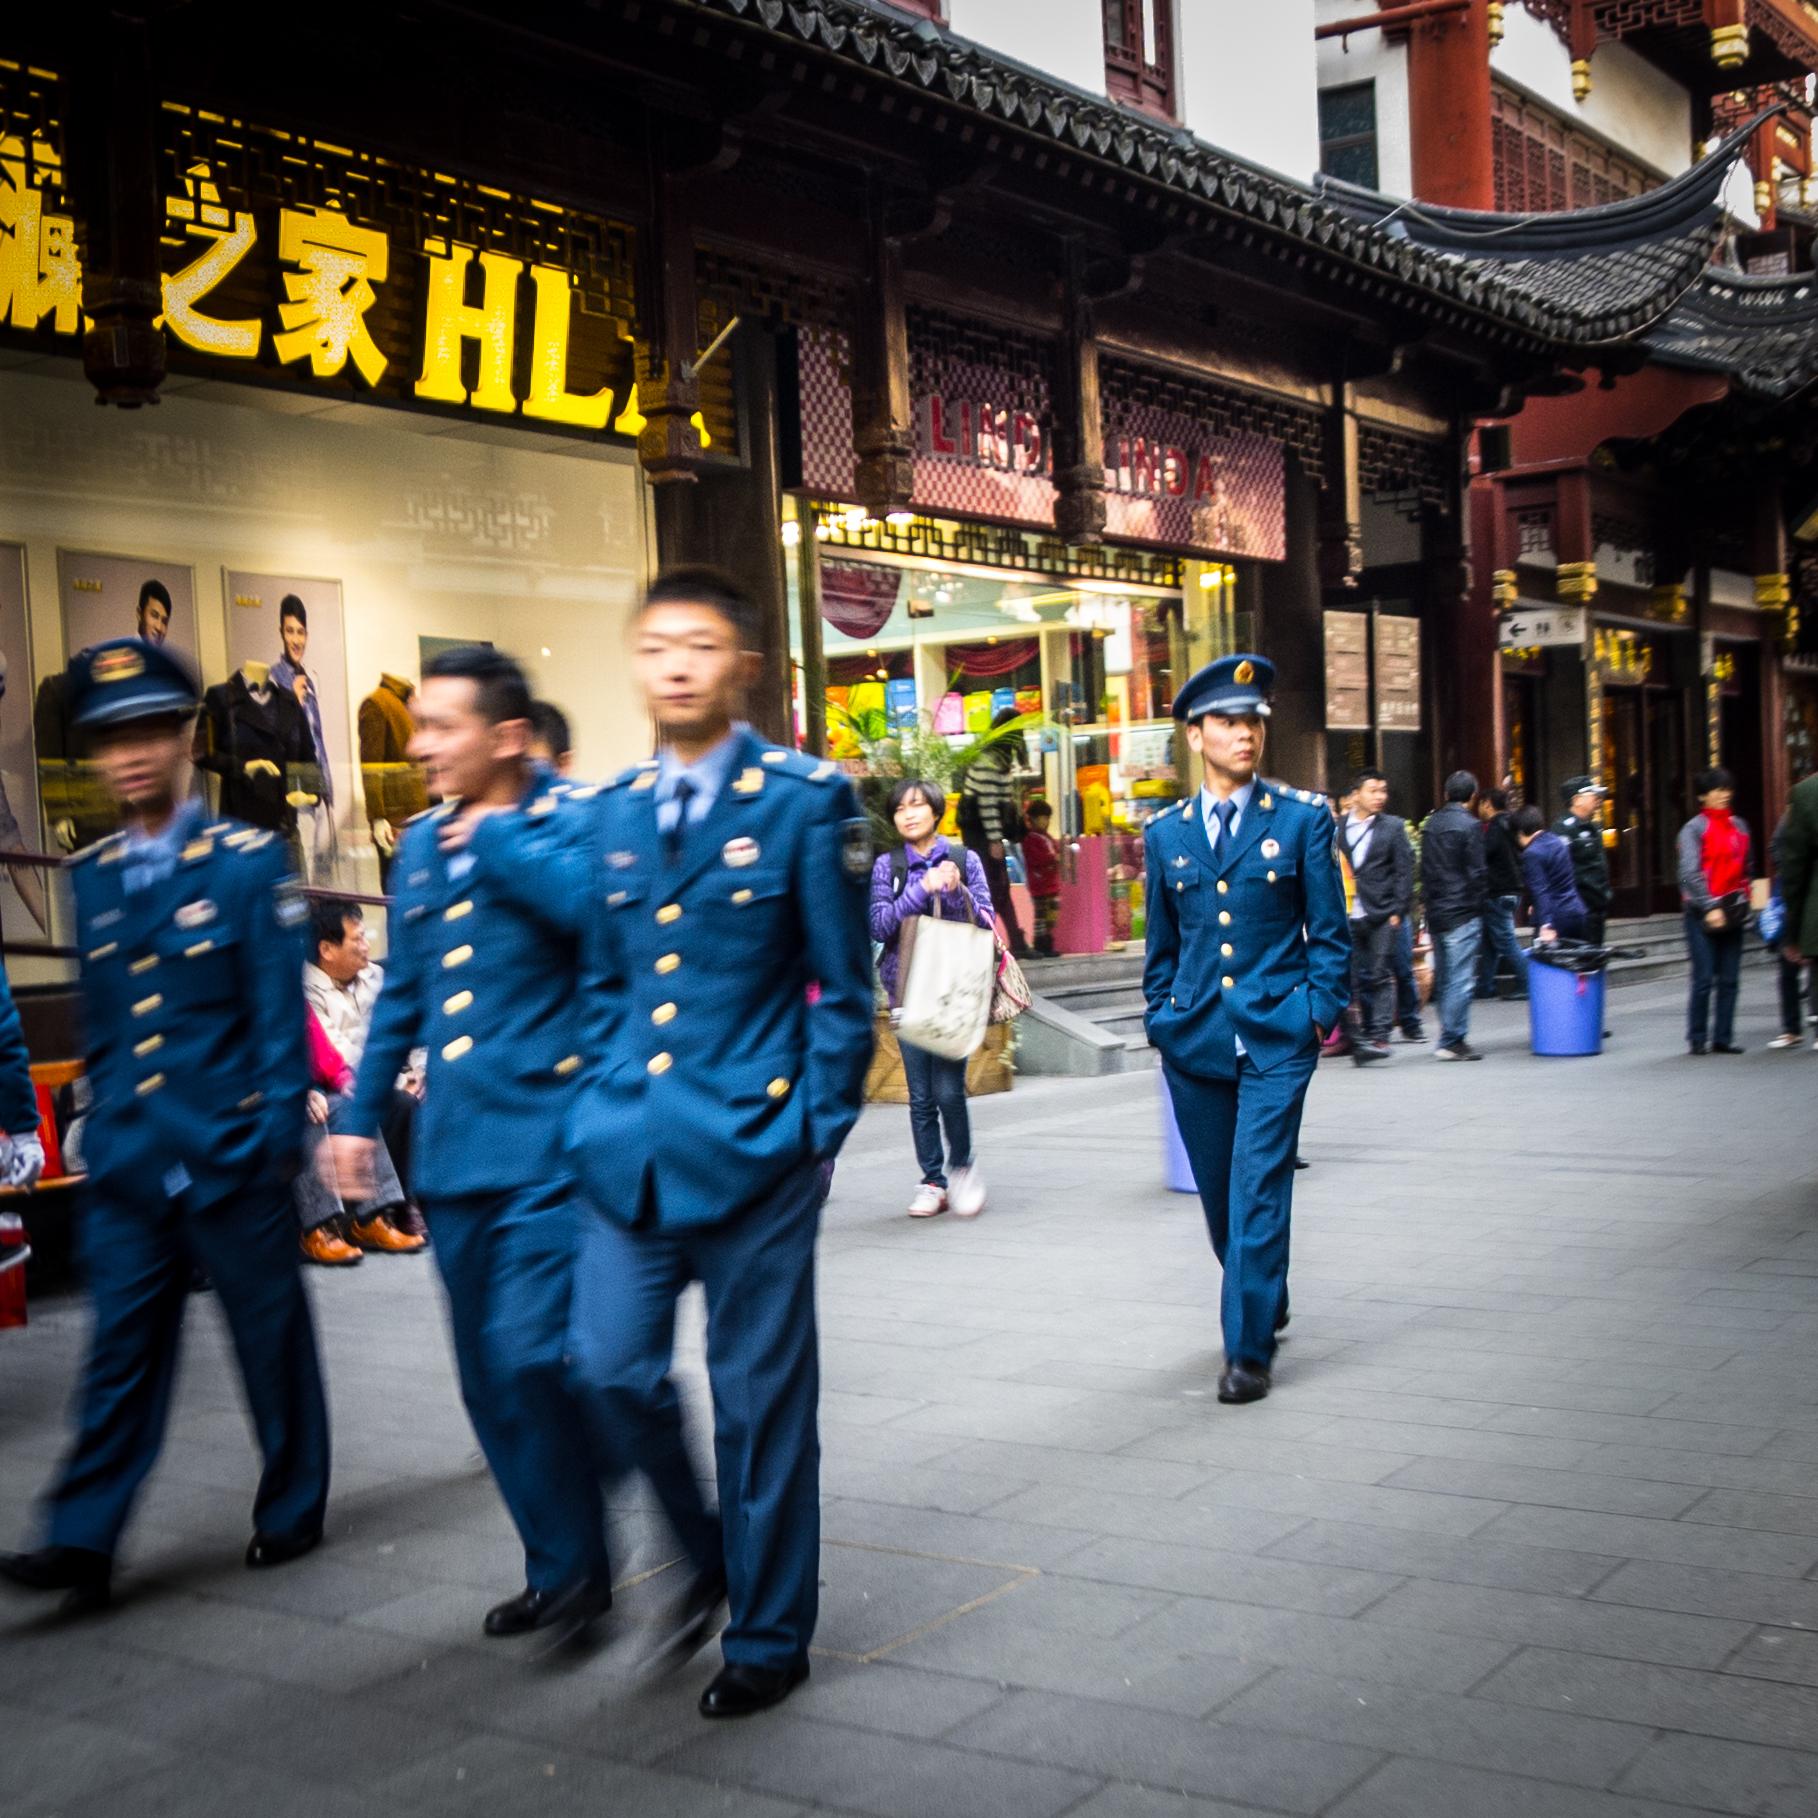 shanghai_soldier_boys.jpg